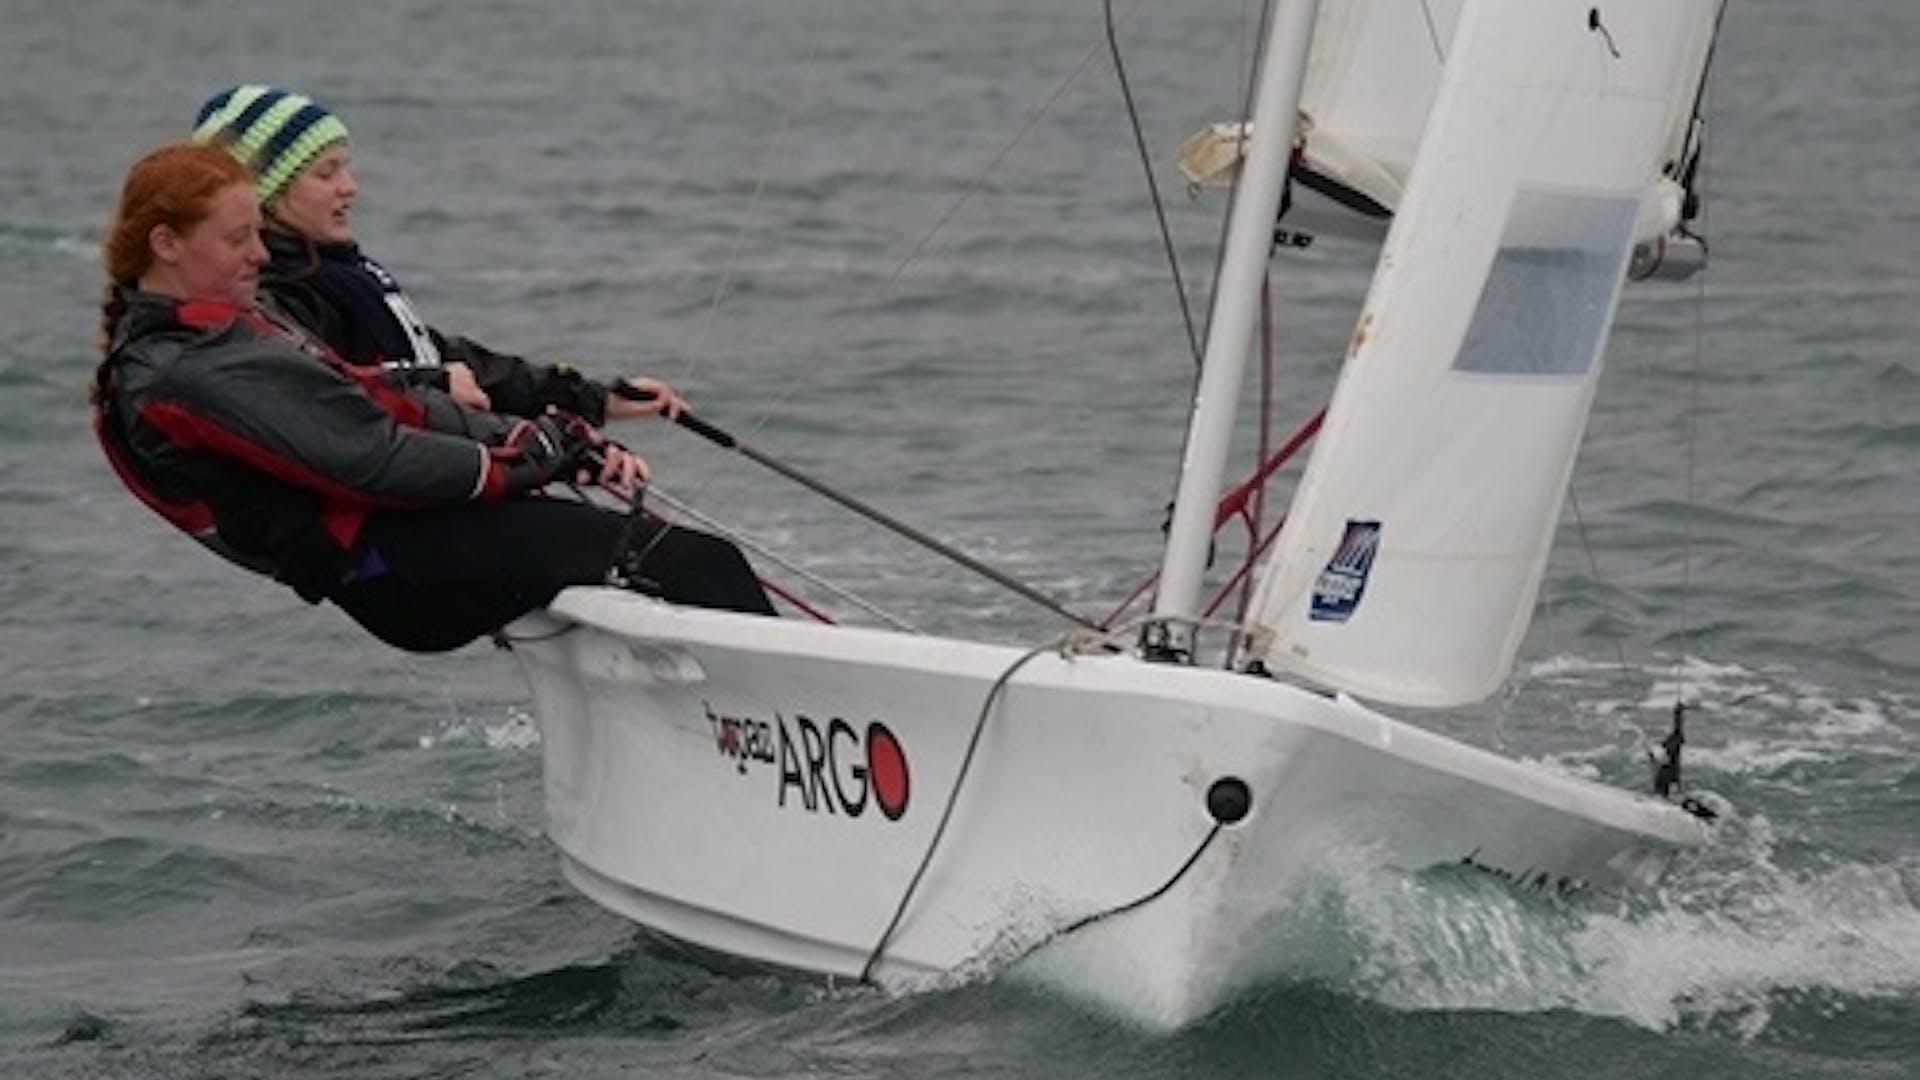 CCF regatta winning Dollar crew small 1